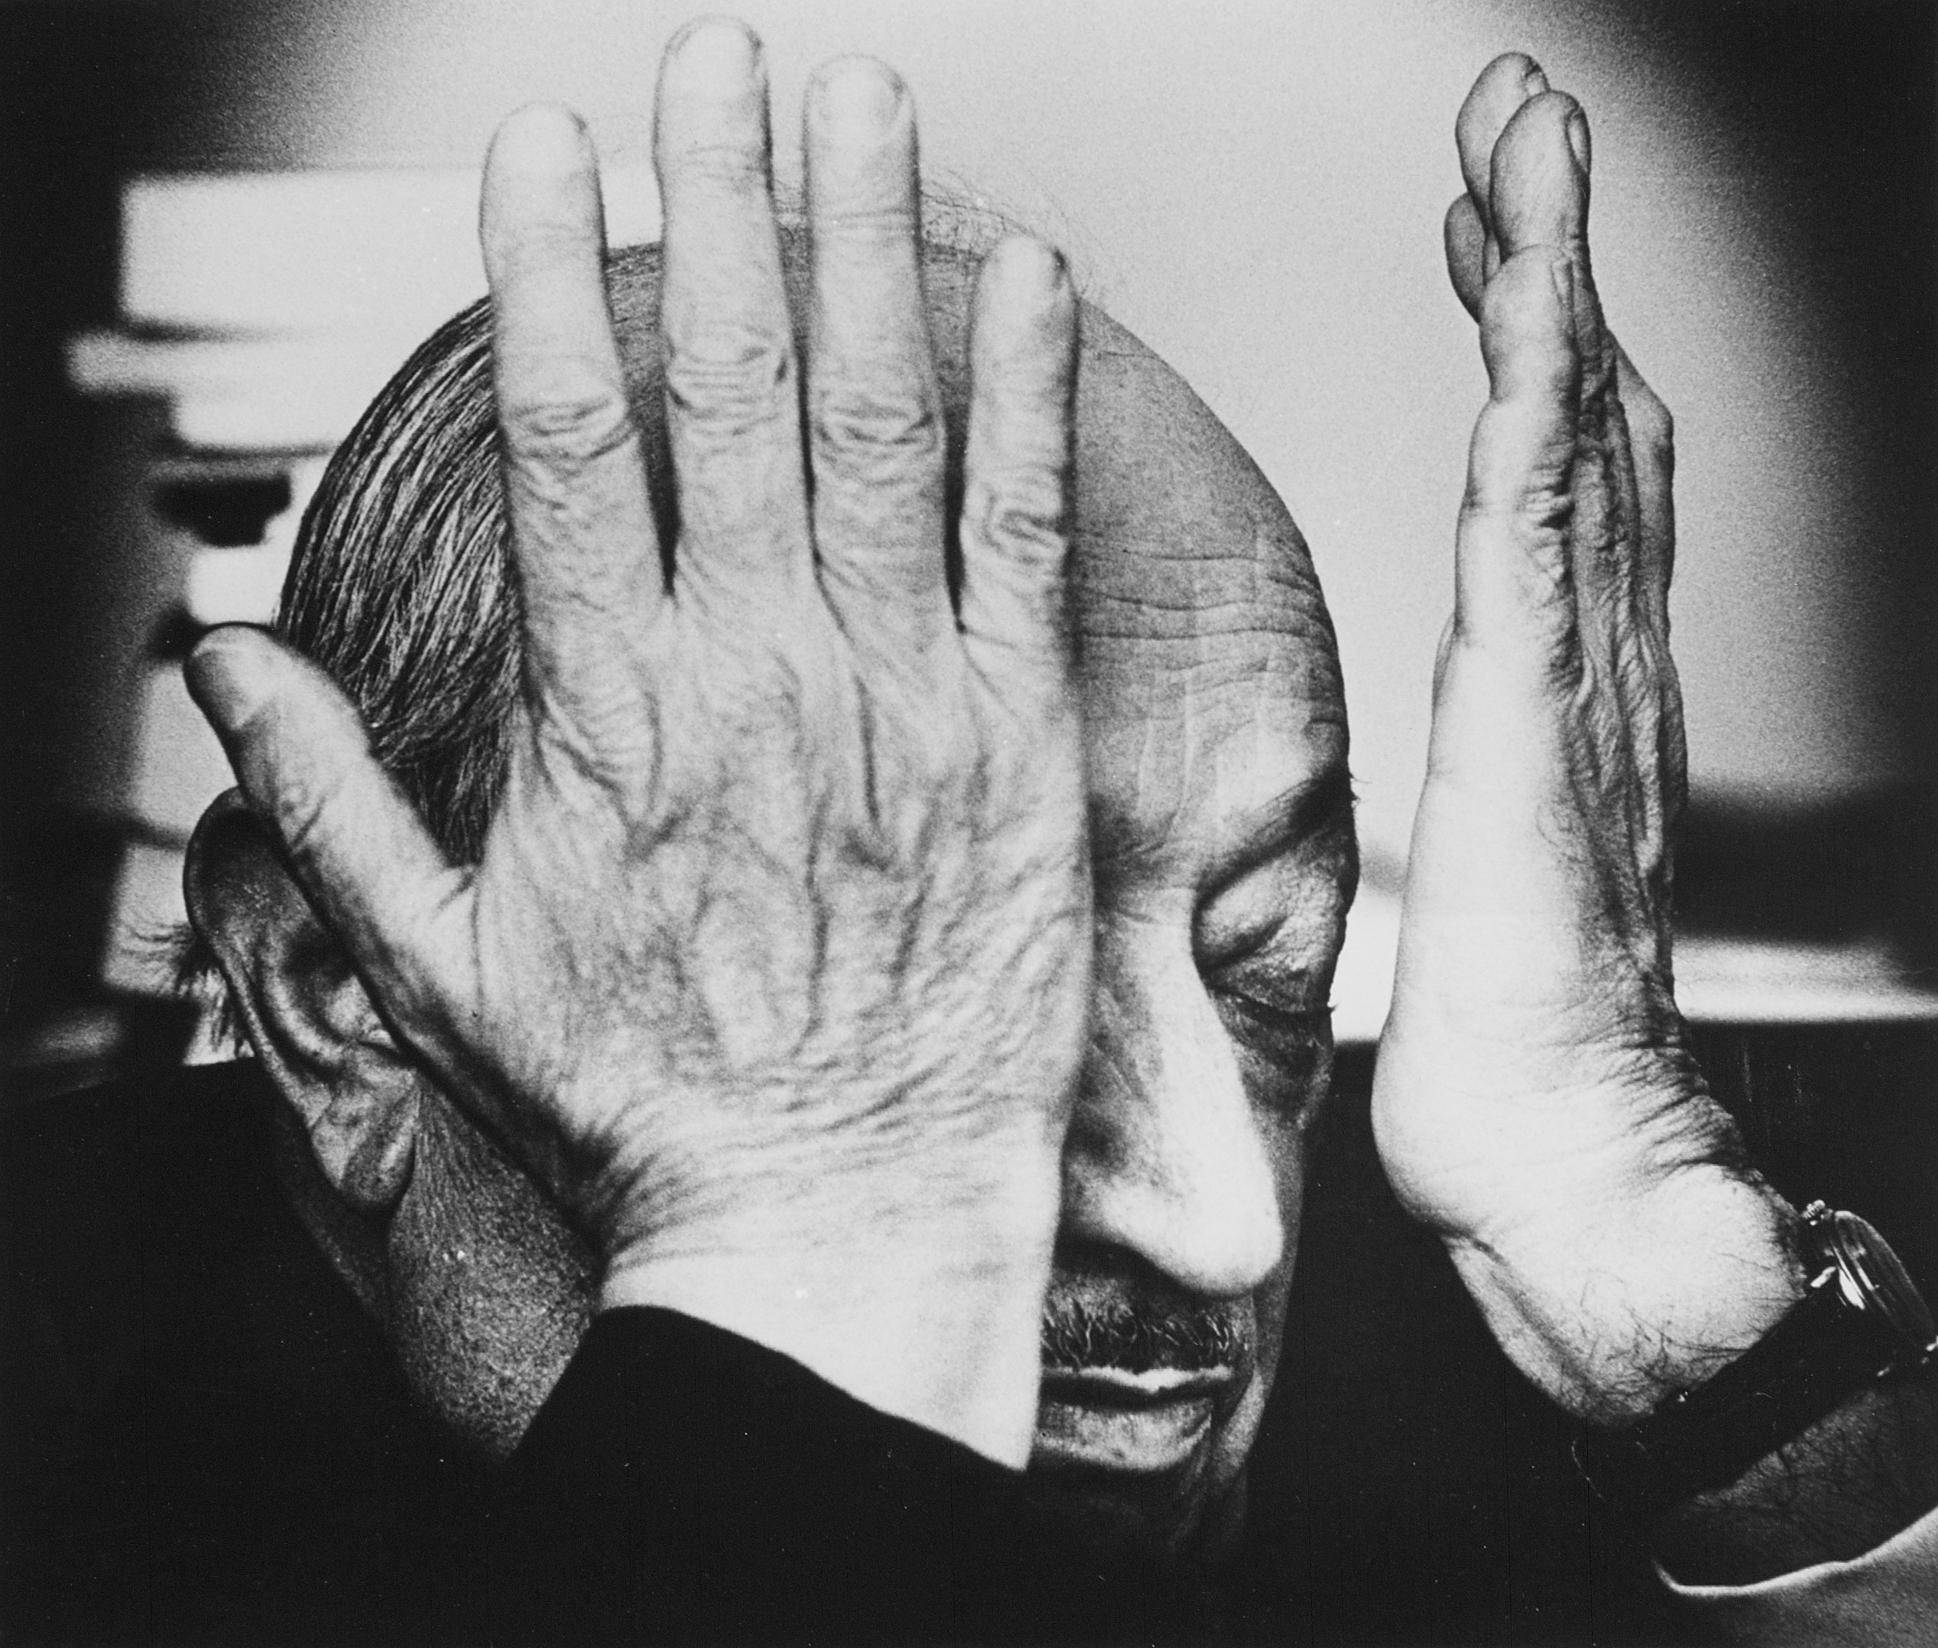 1980 Floris Bergkamp